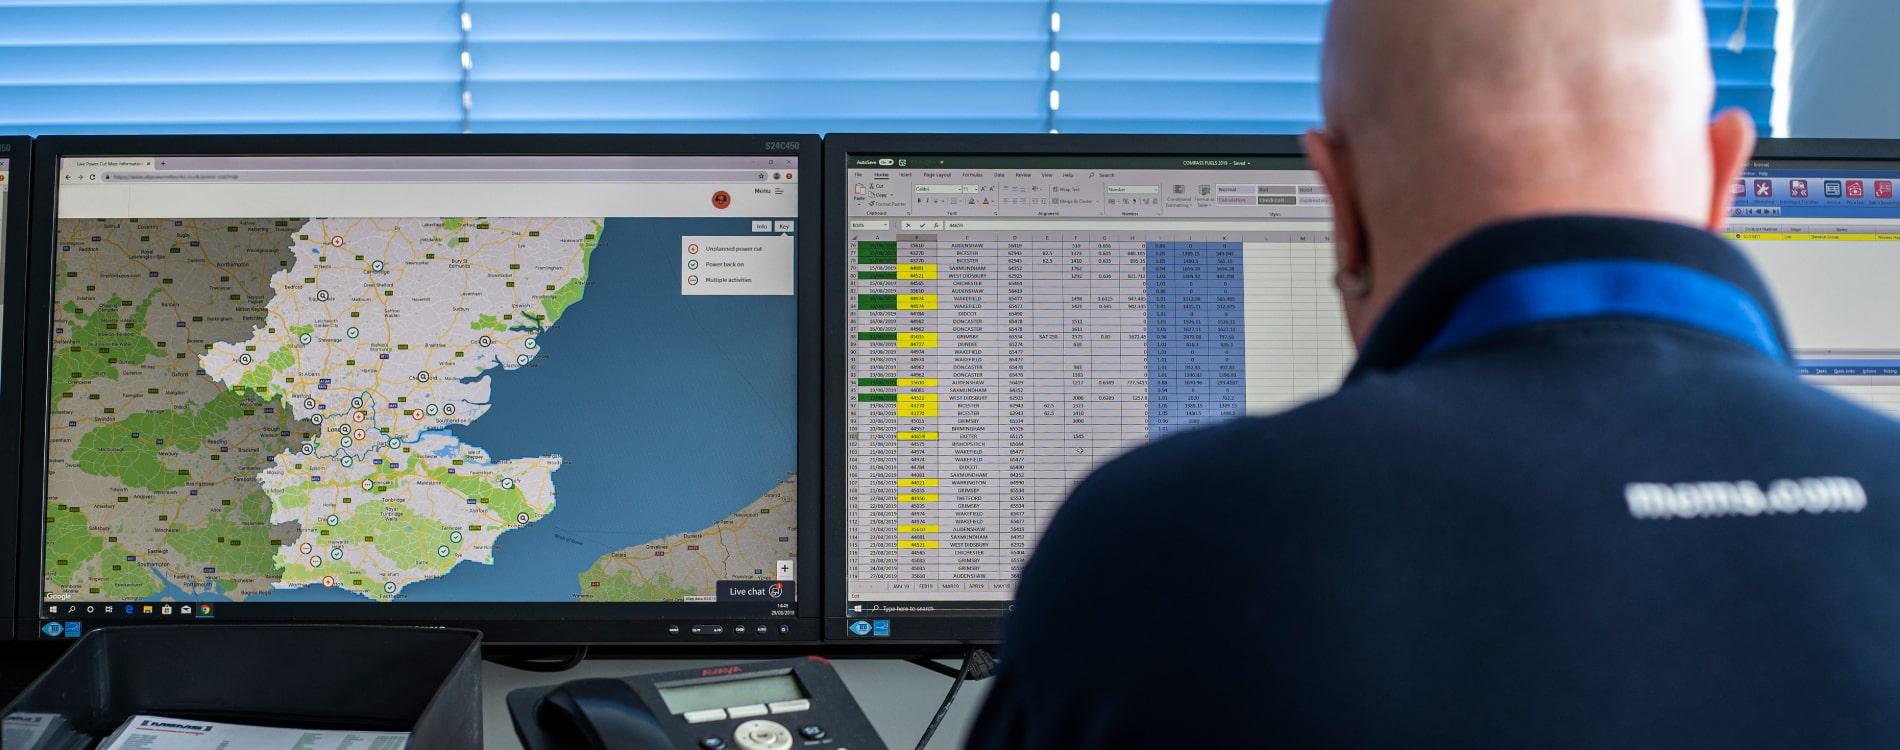 tracking-telemetry